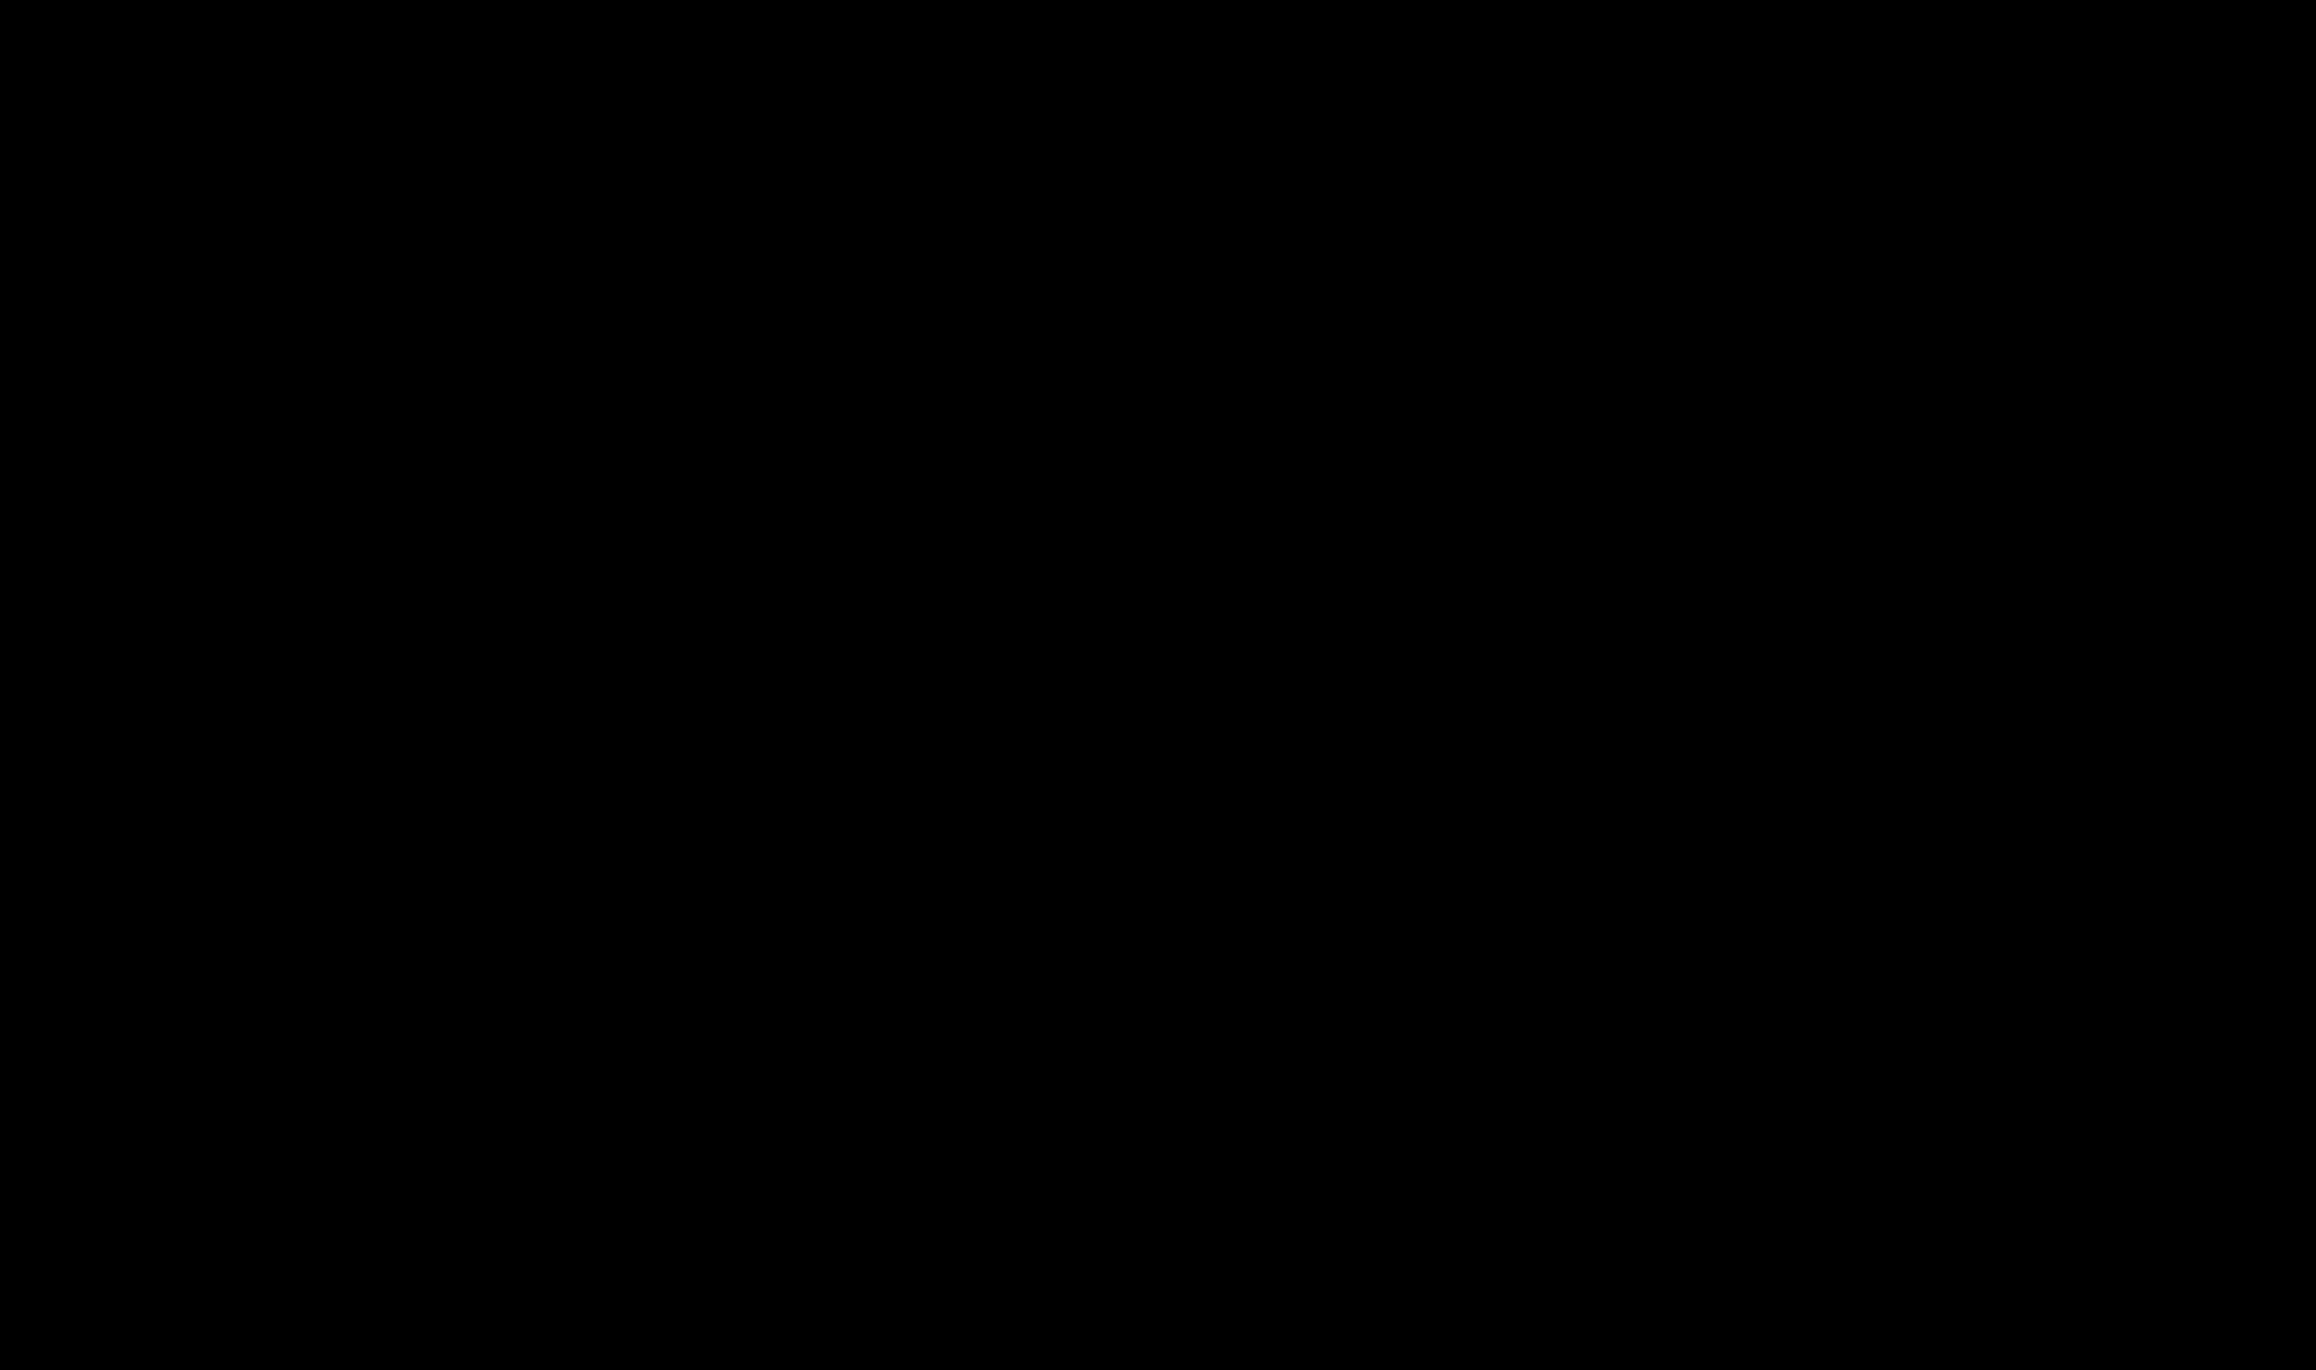 Line Art Black And White : Clipart lotus line art